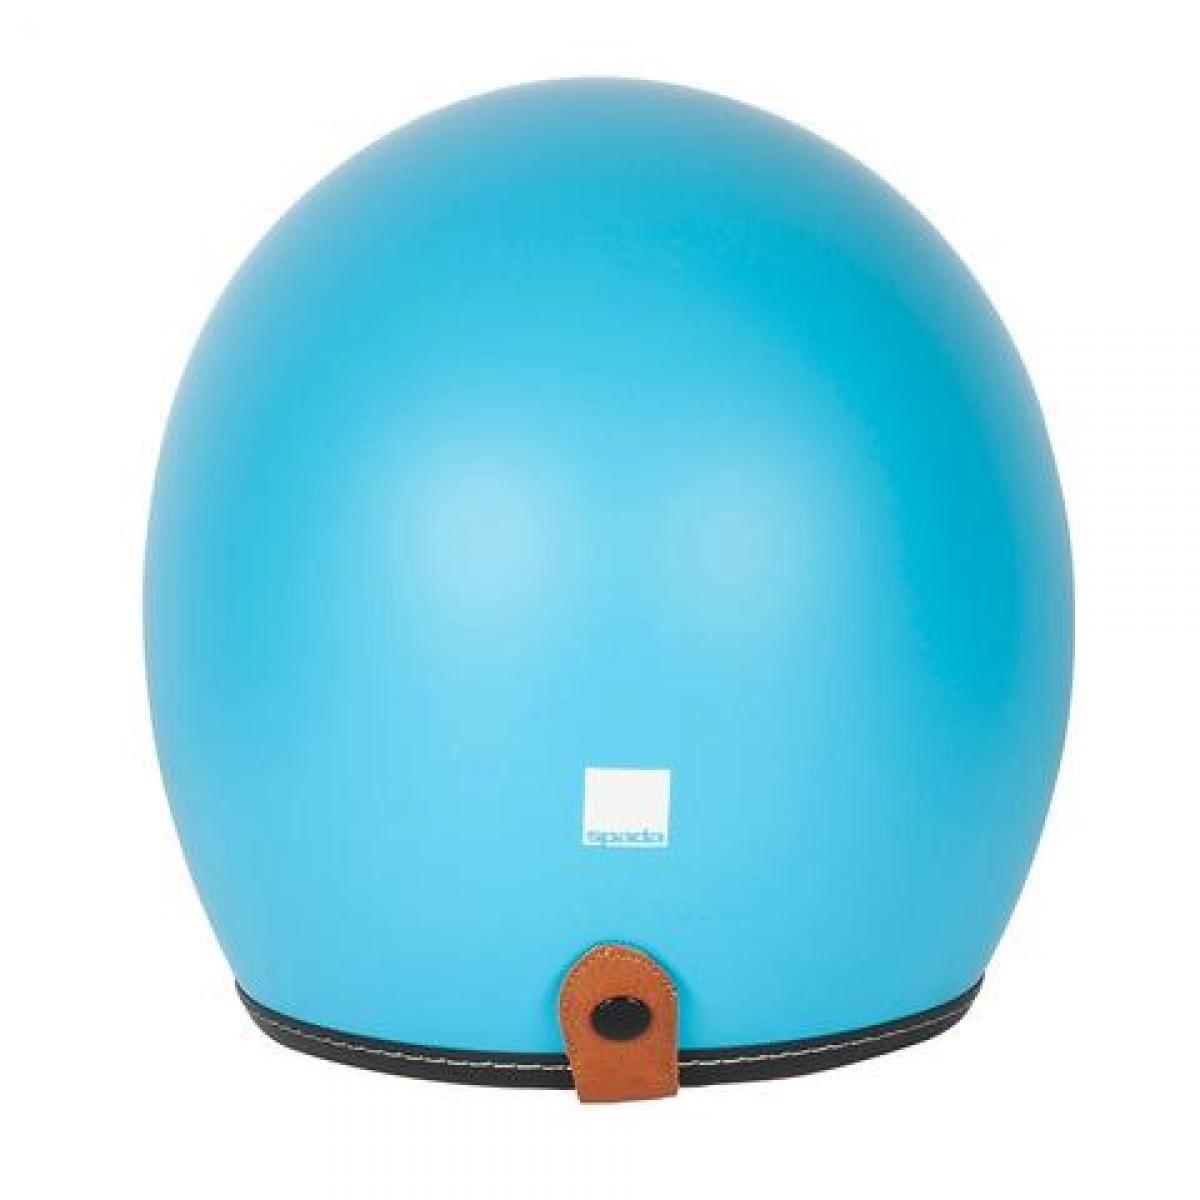 Spada-Raze-Ouvert-Casque-Bleu-Integre-Visiere miniature 22